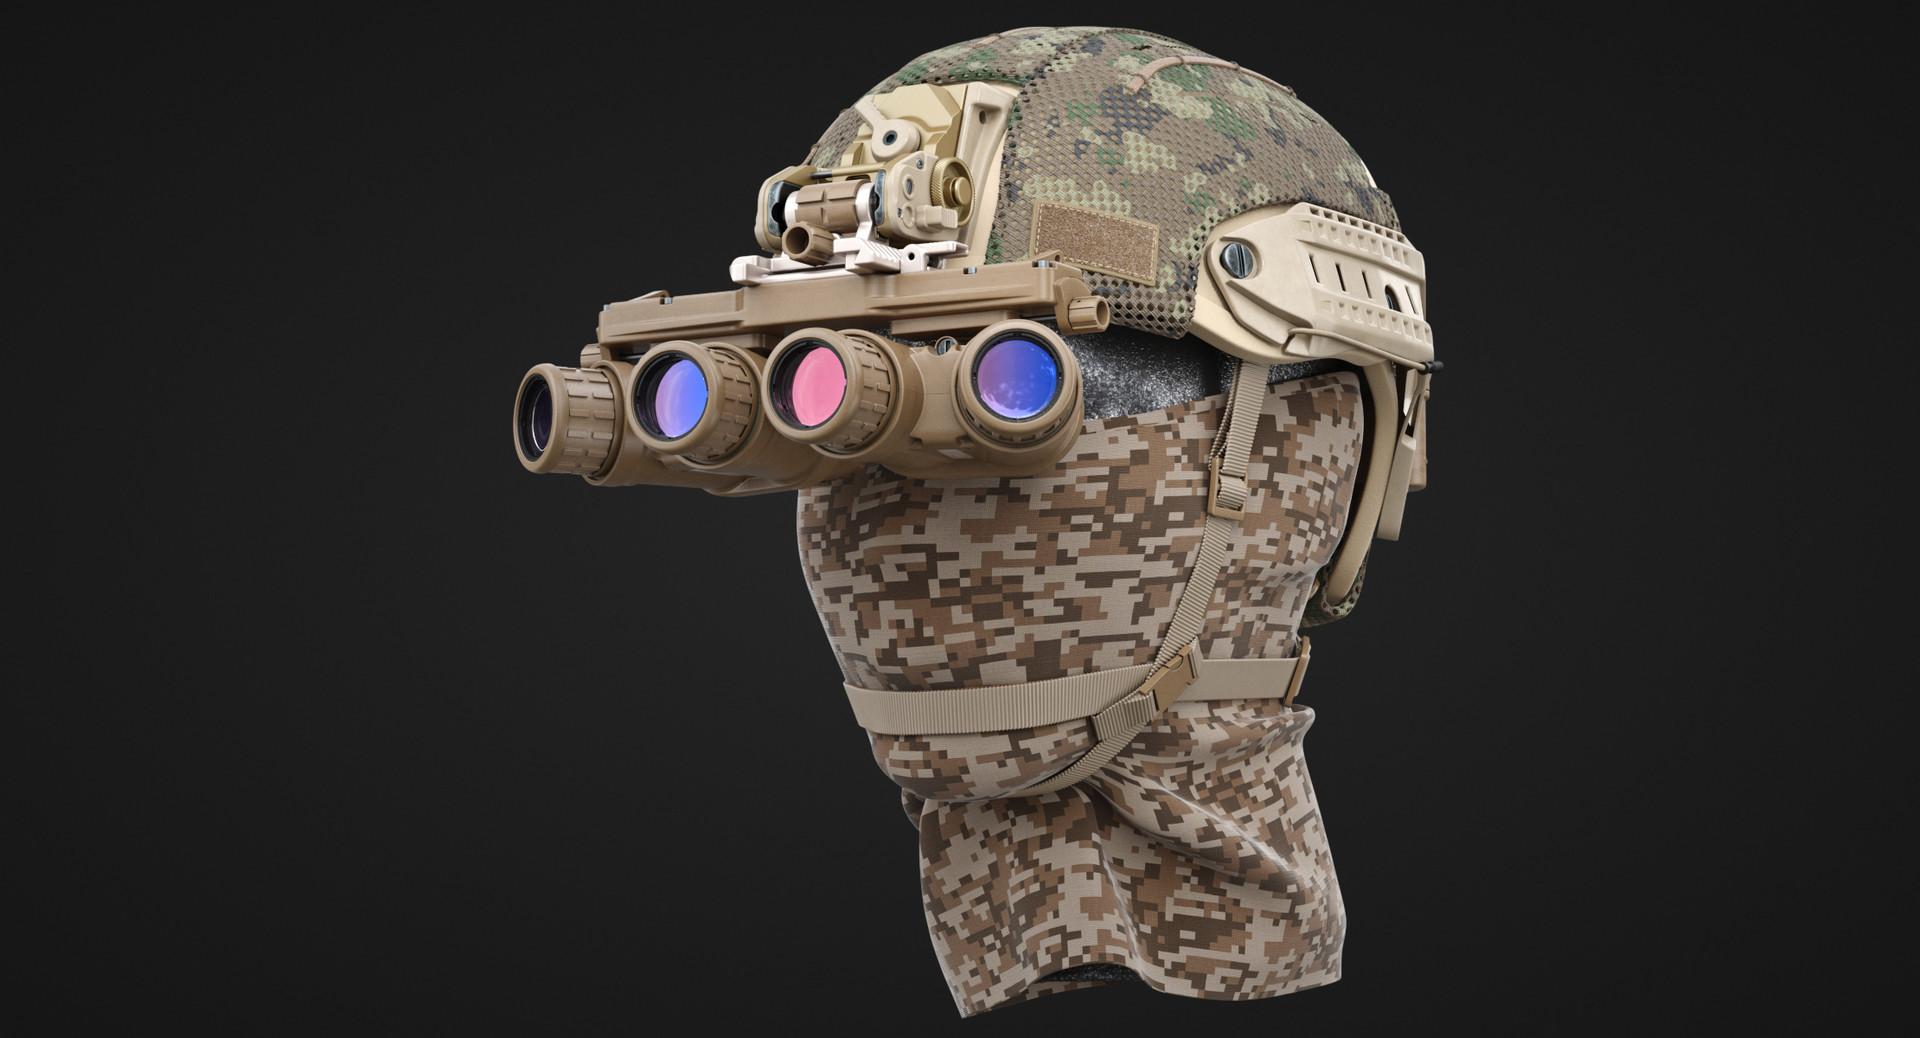 ArtStation - Military Helmet Night Goggle, Dima Ishutin